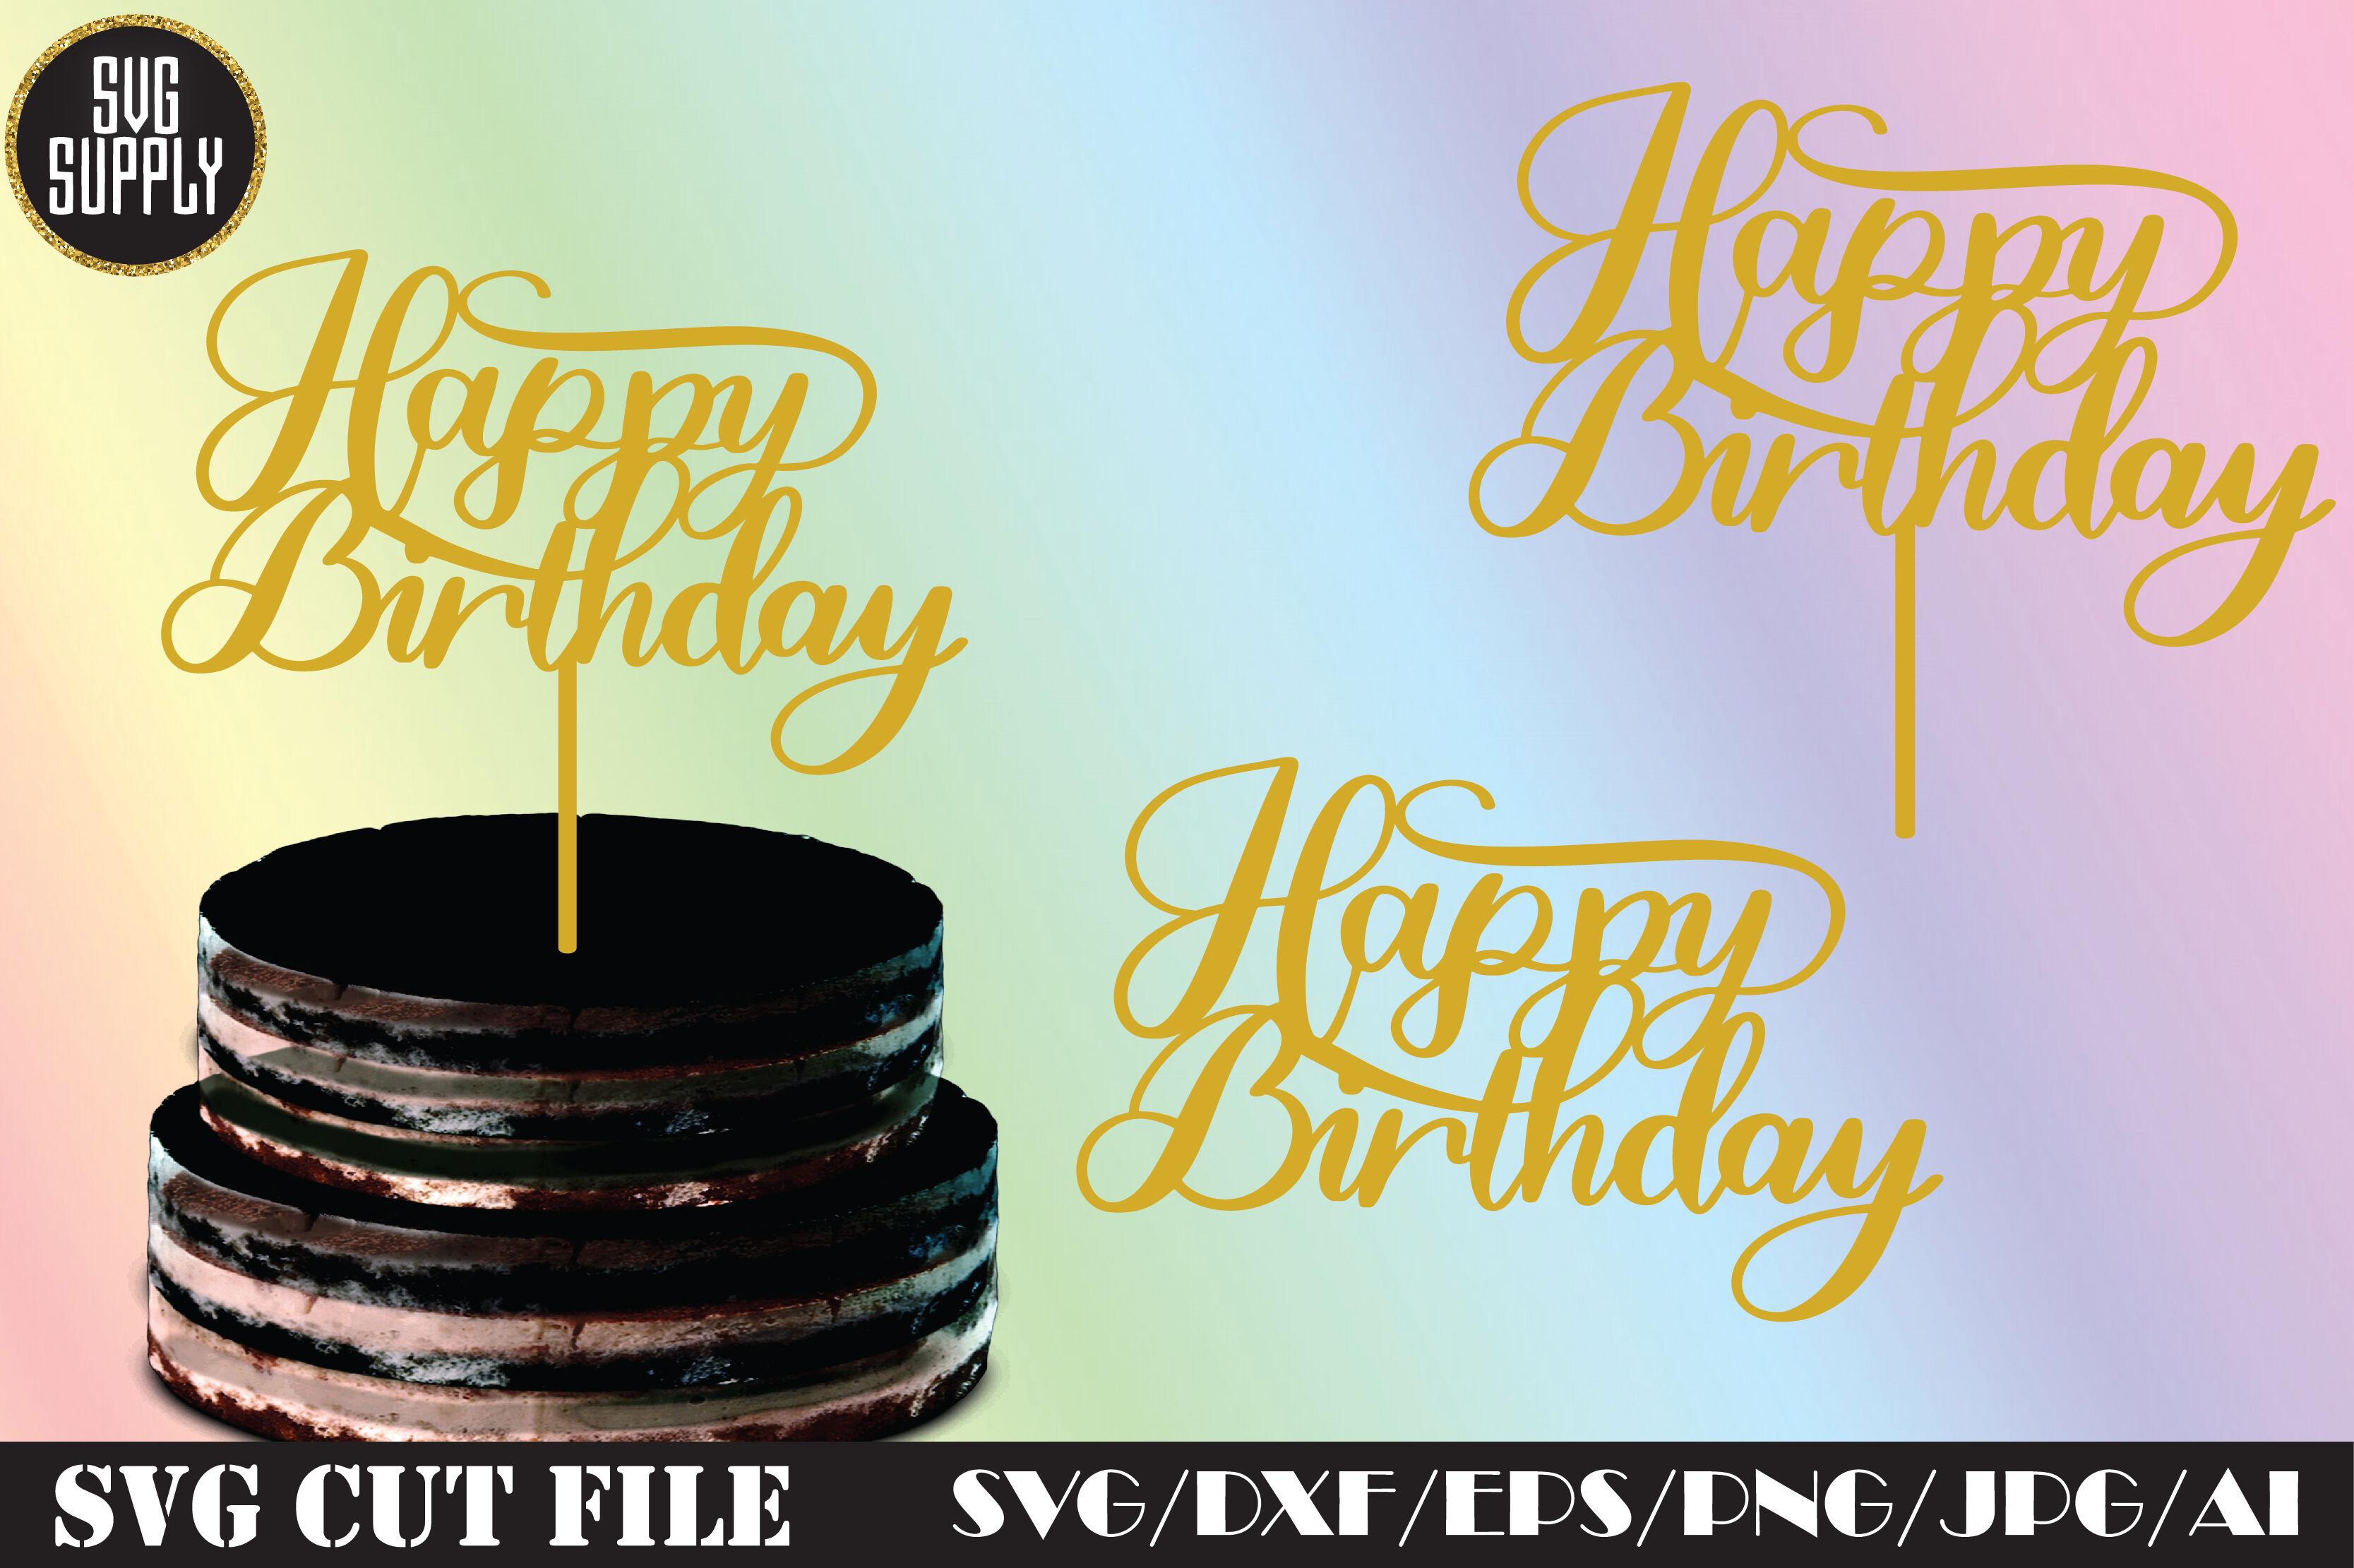 Cake Topper Happy Birthday Svg Cut File By Svgsupply